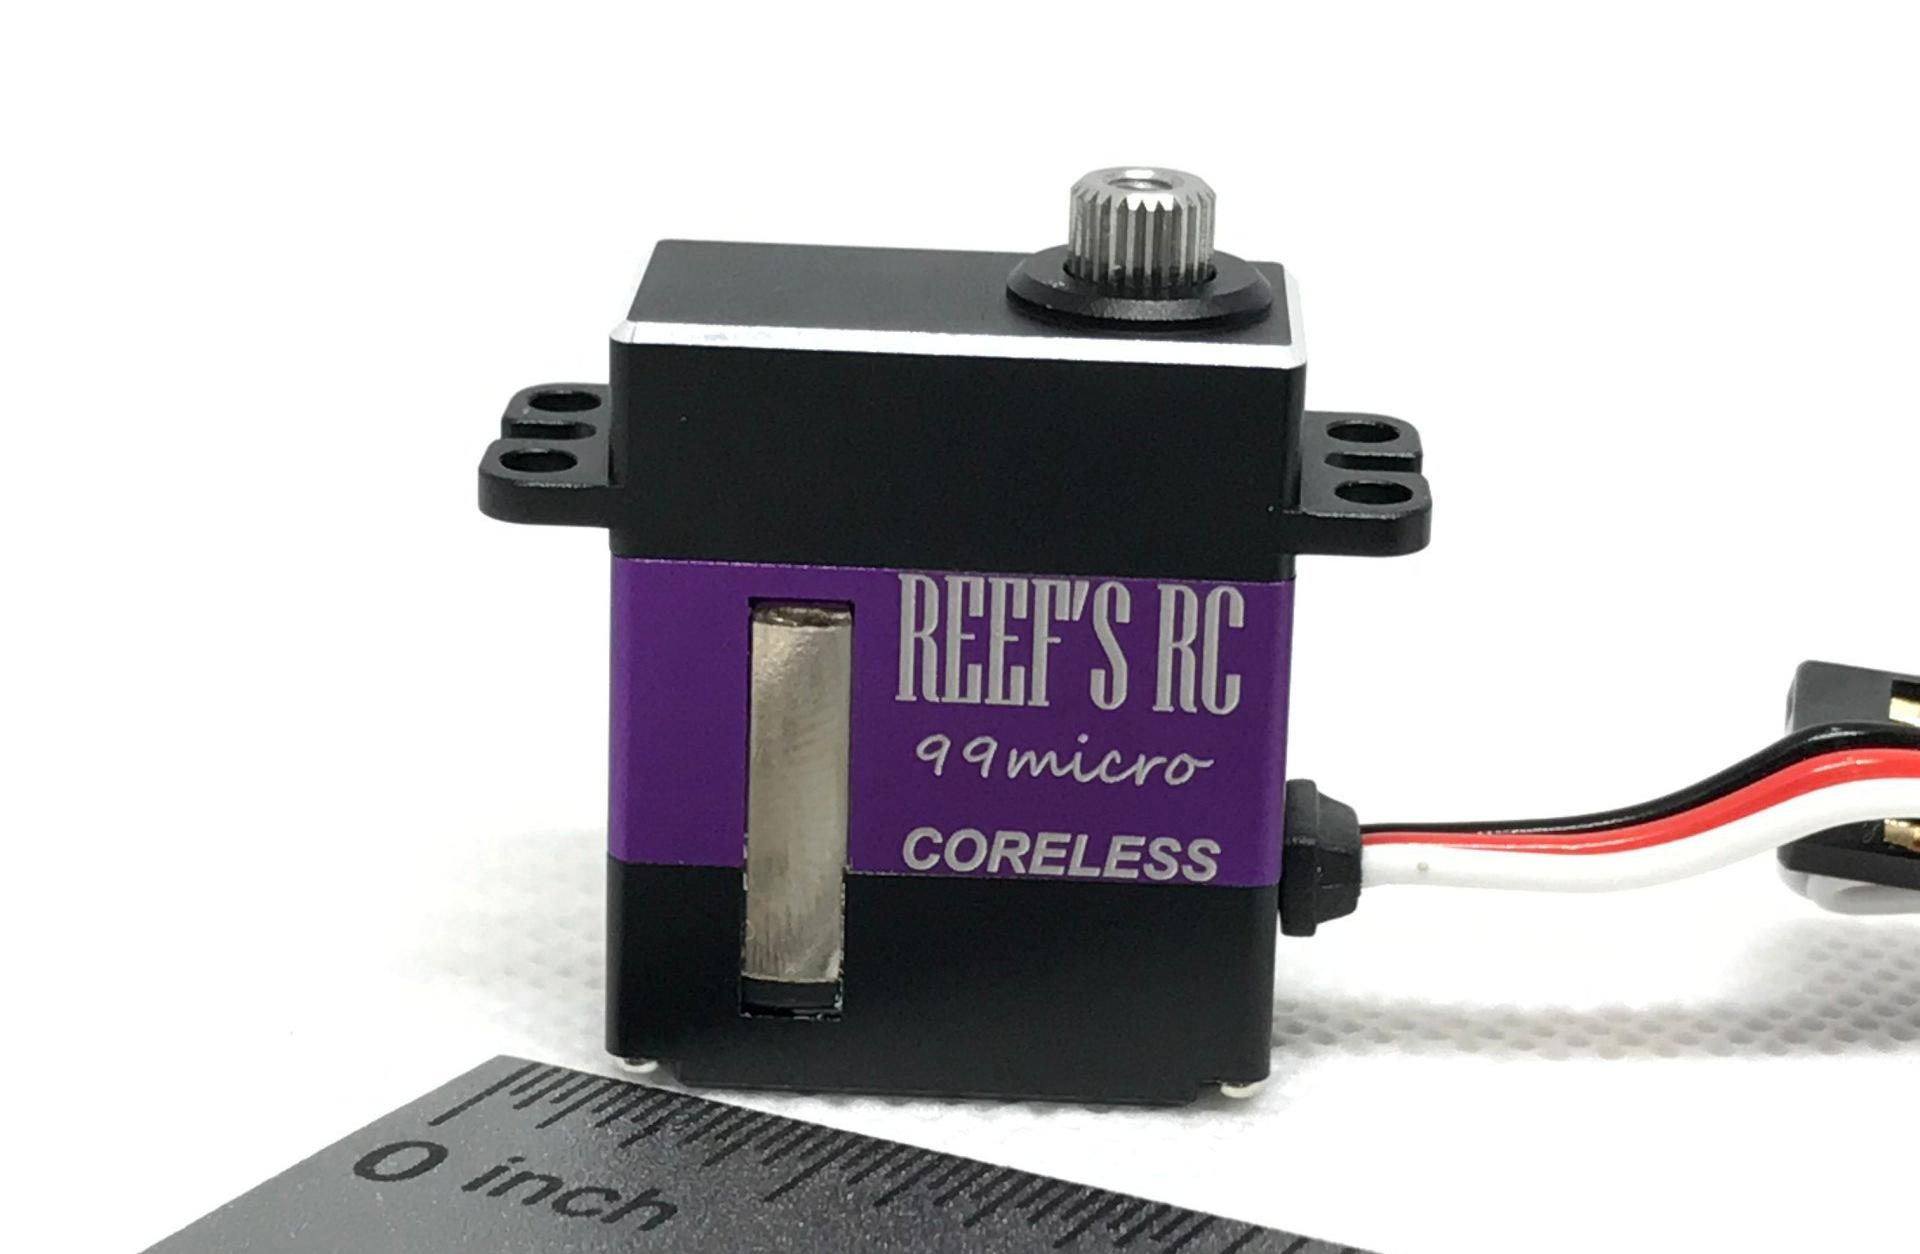 REEF'S RC 99:Micro Servo